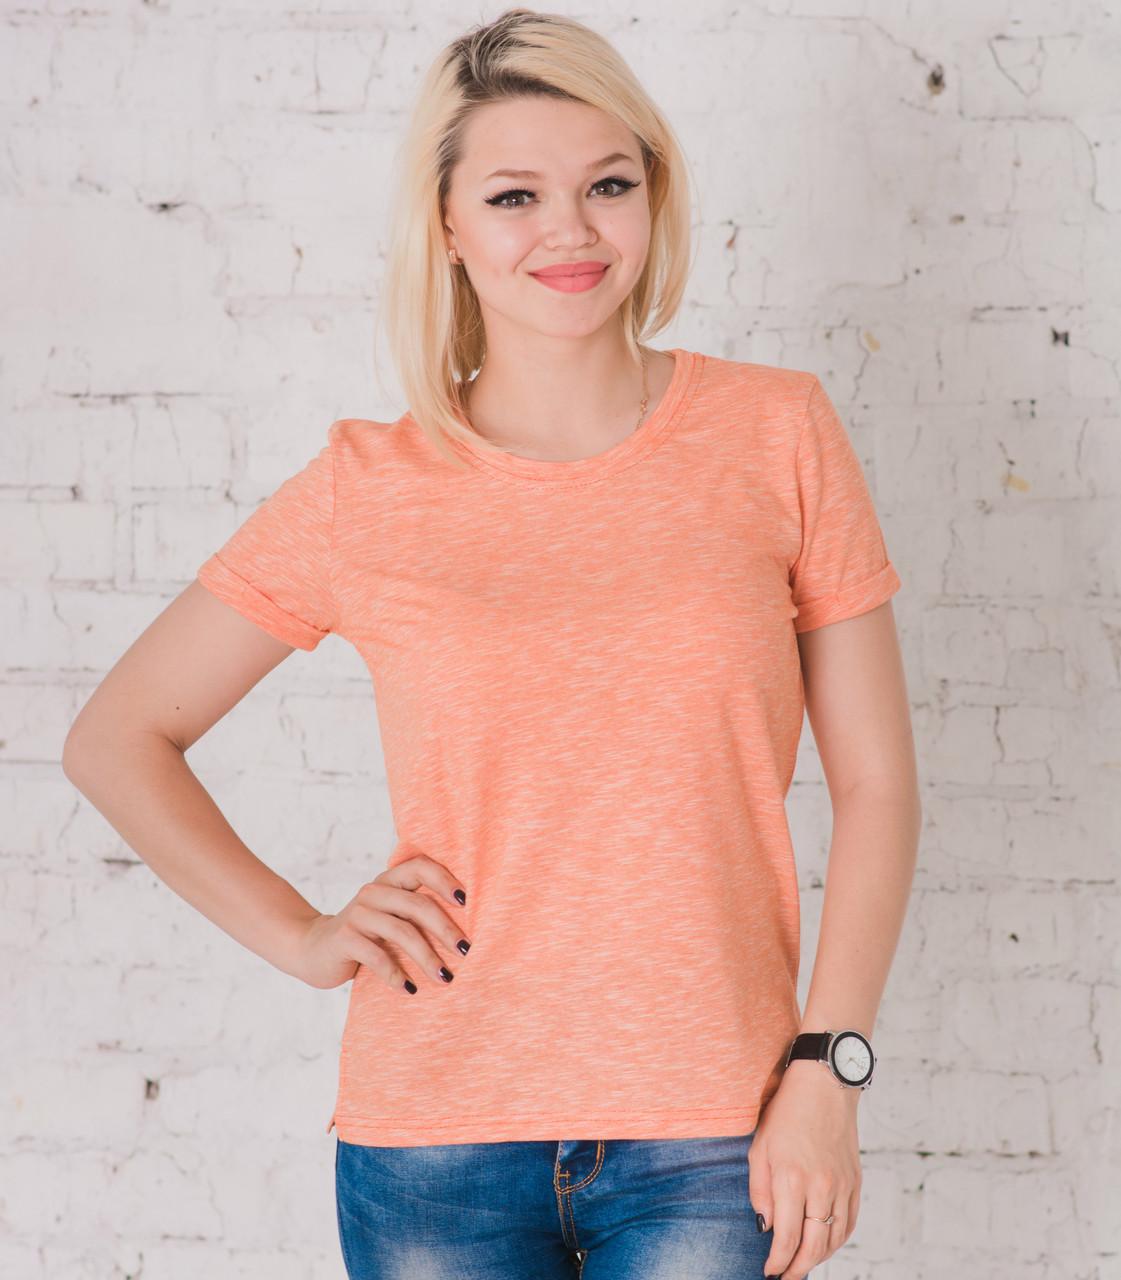 Bono Женская футболка оранжевый меланж 000136